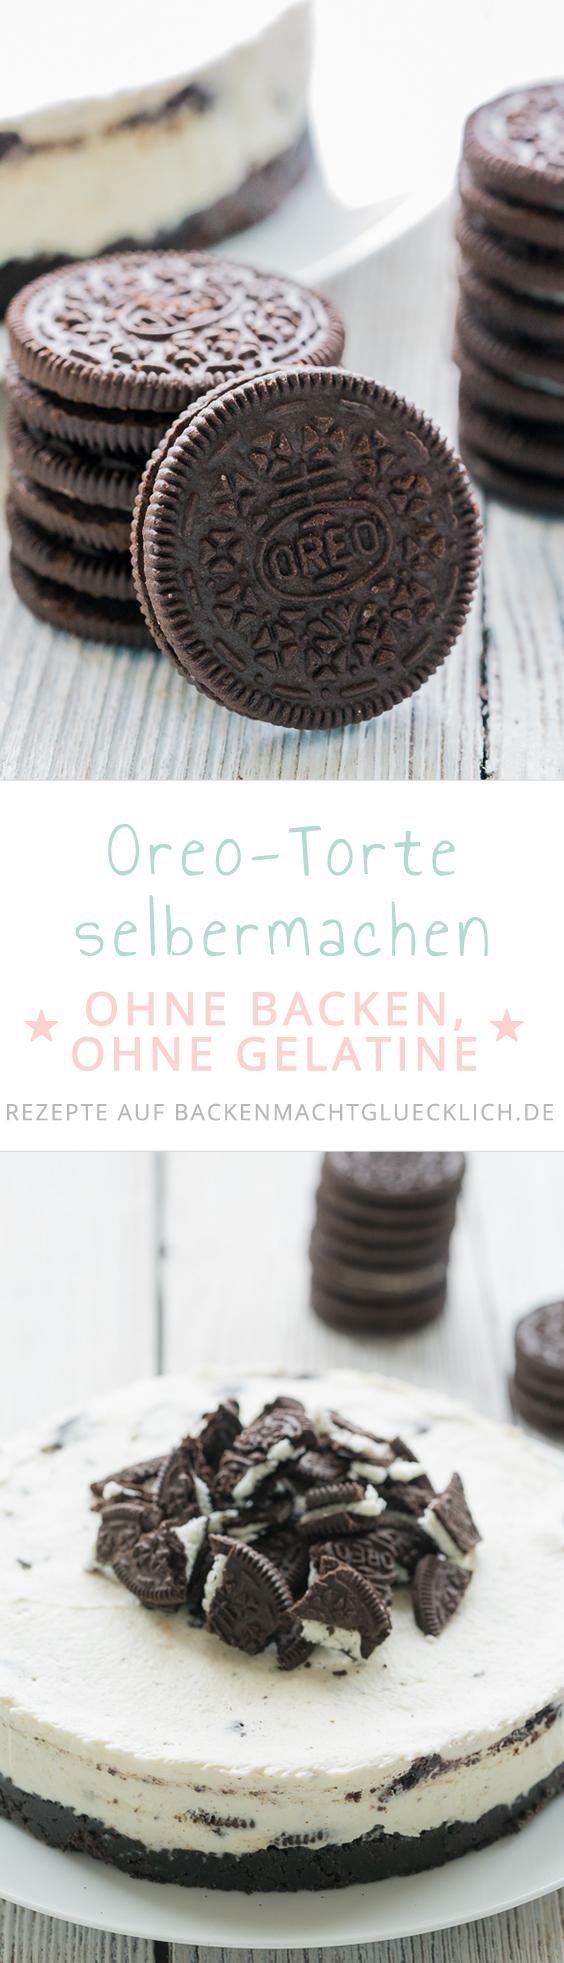 Oreo Torte Ohne Backen Rezept Backenmachtglucklich Rezepte